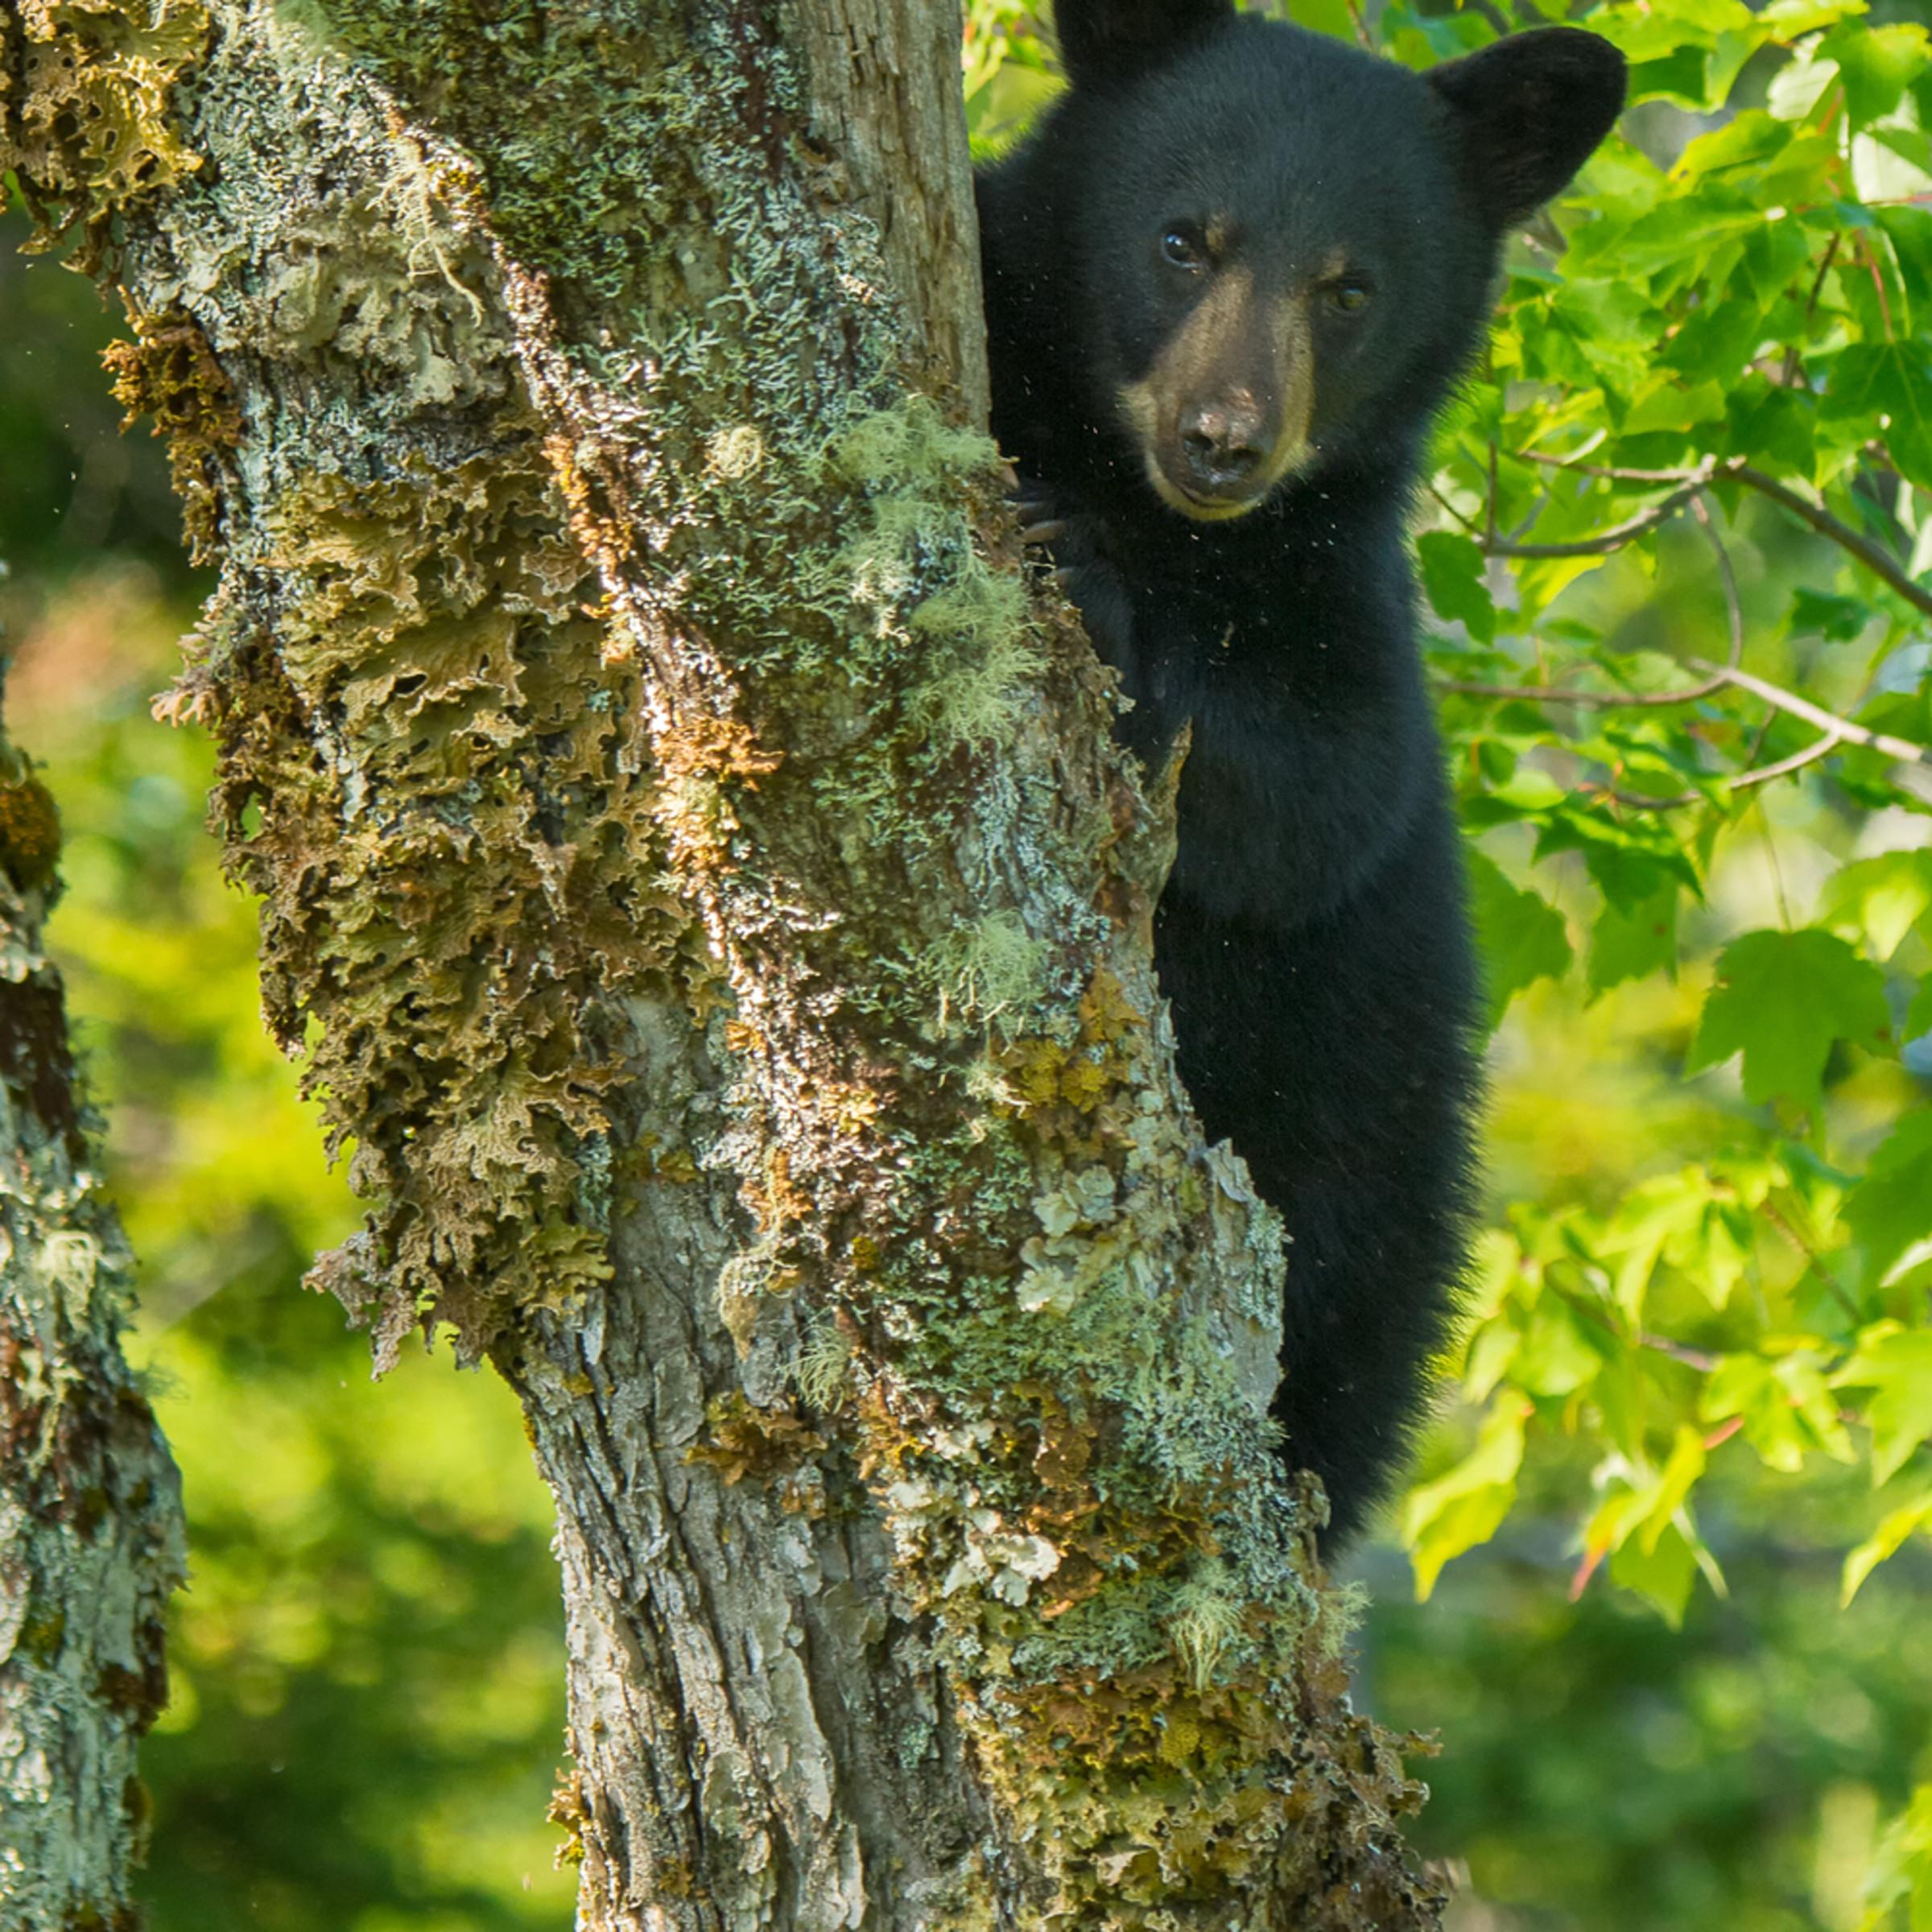 Bear cub so8vog